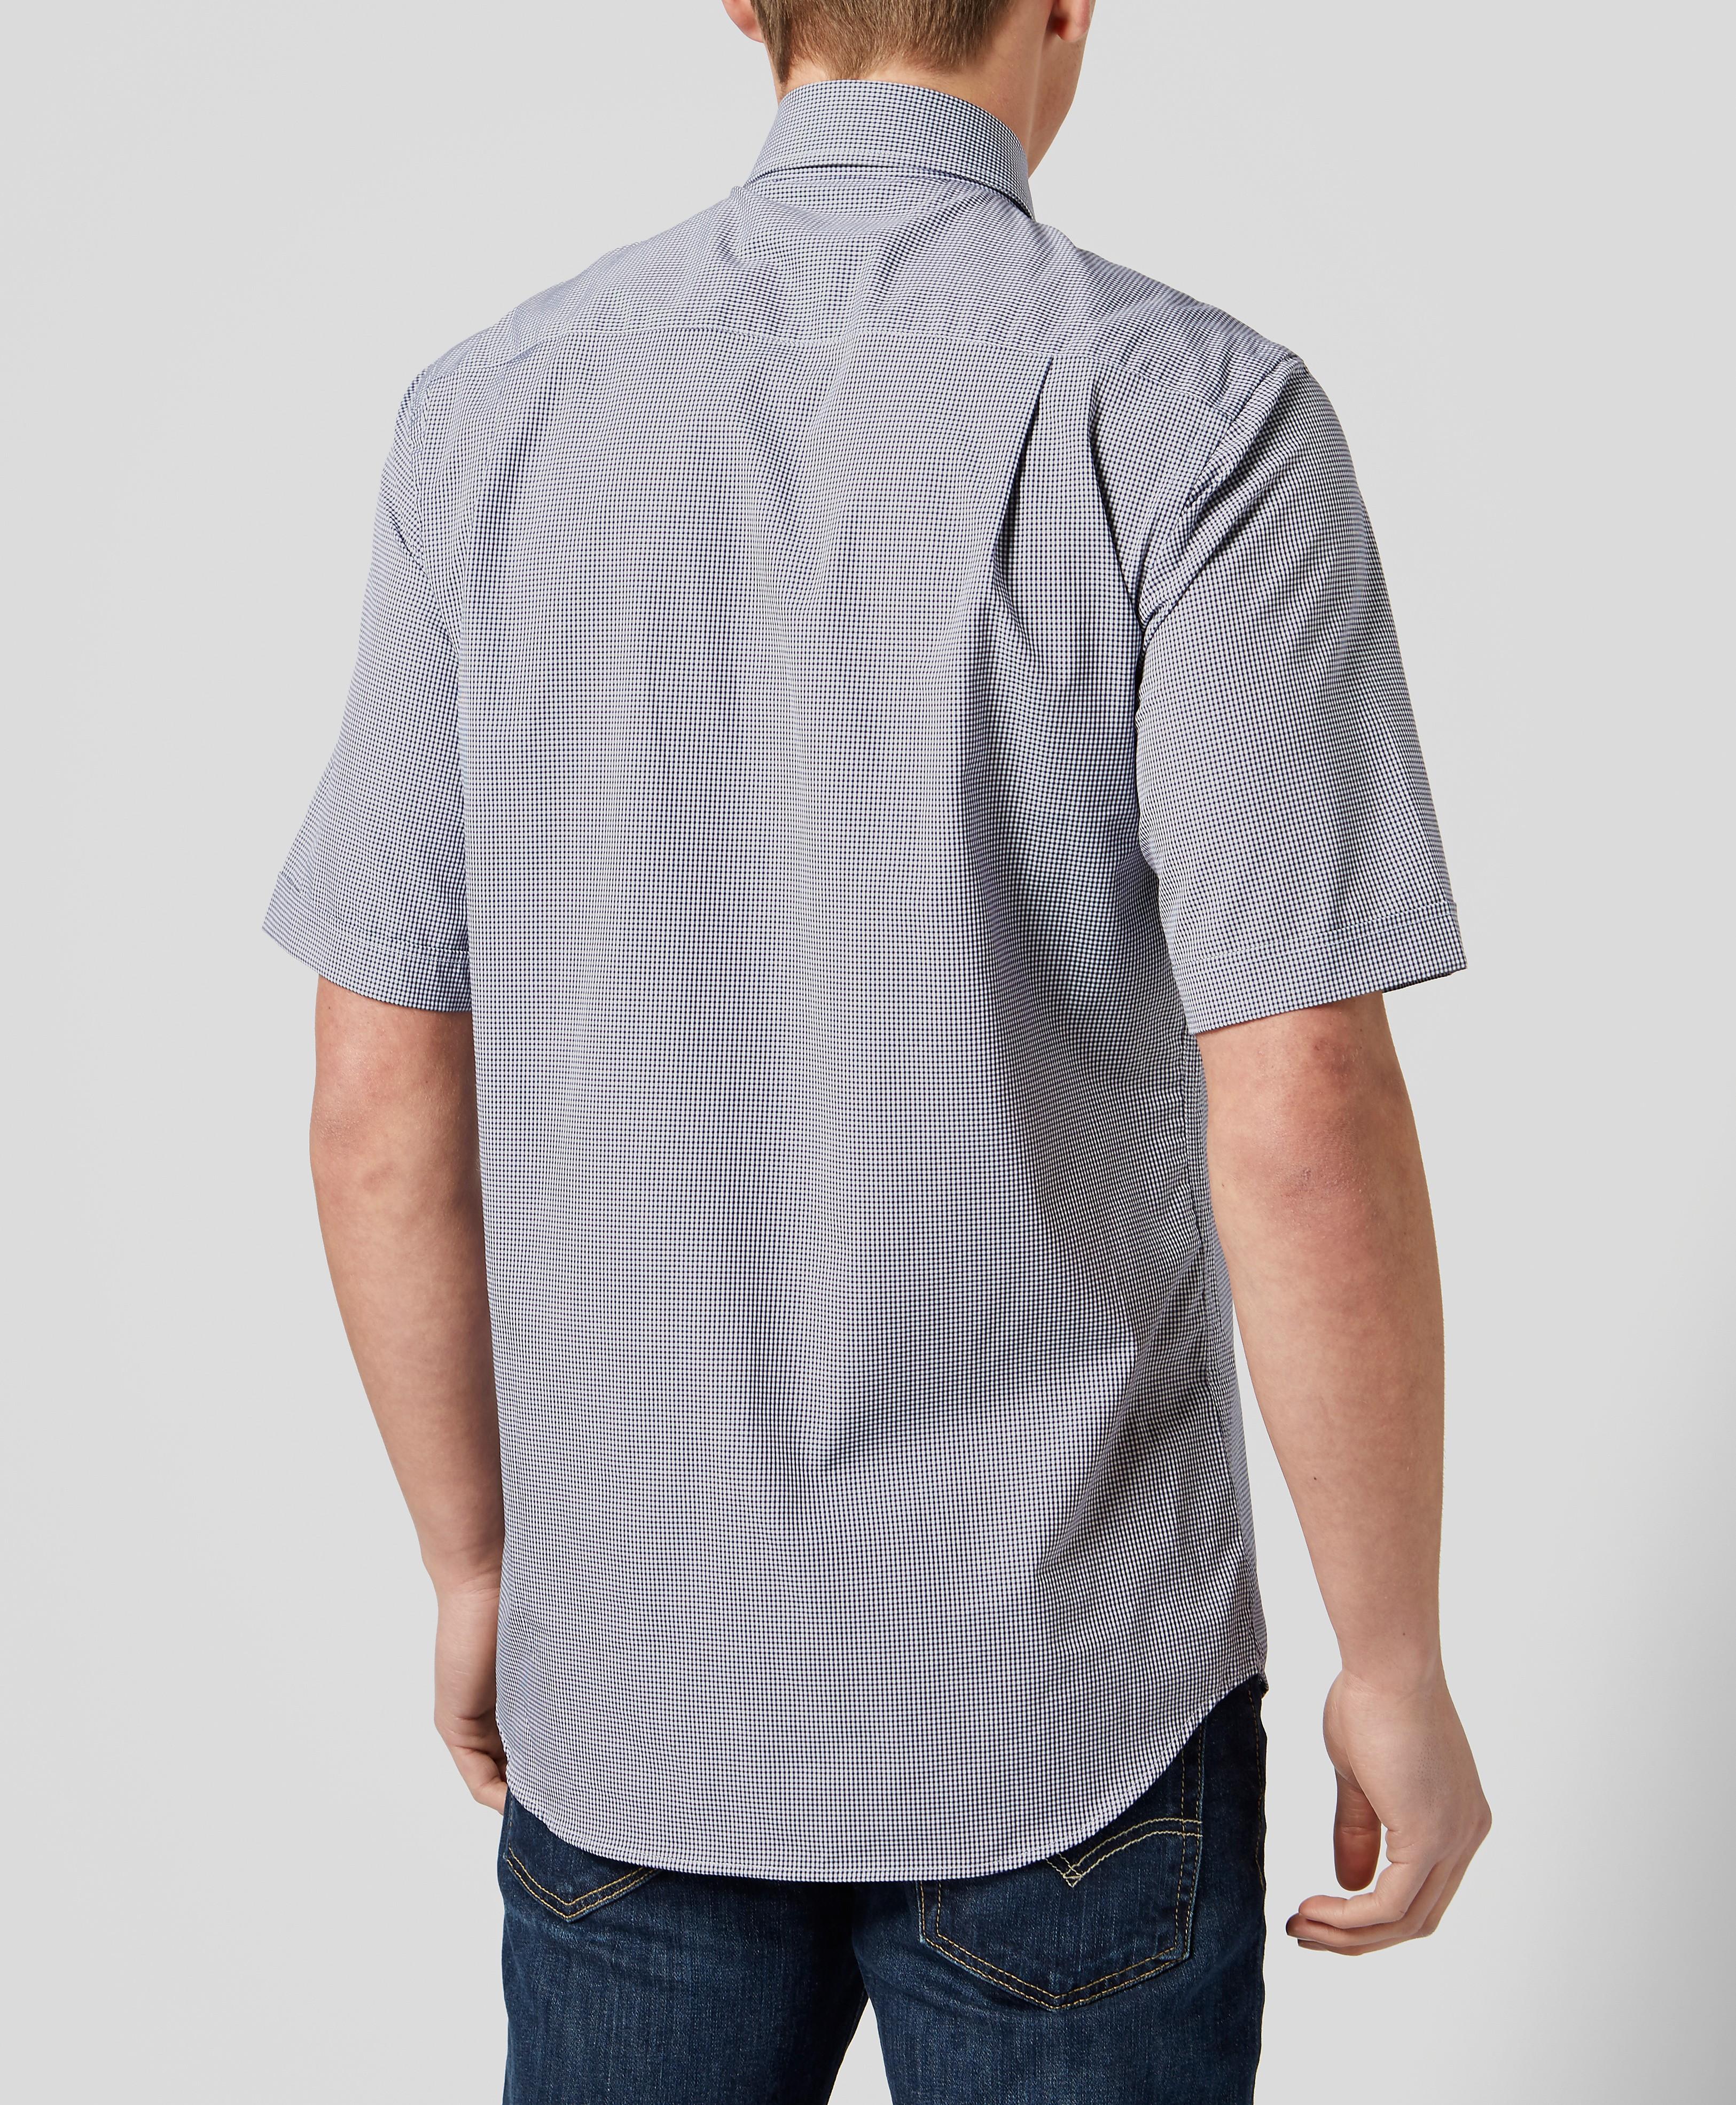 Paul and Shark Mini Gingham Short Sleeve Shirt